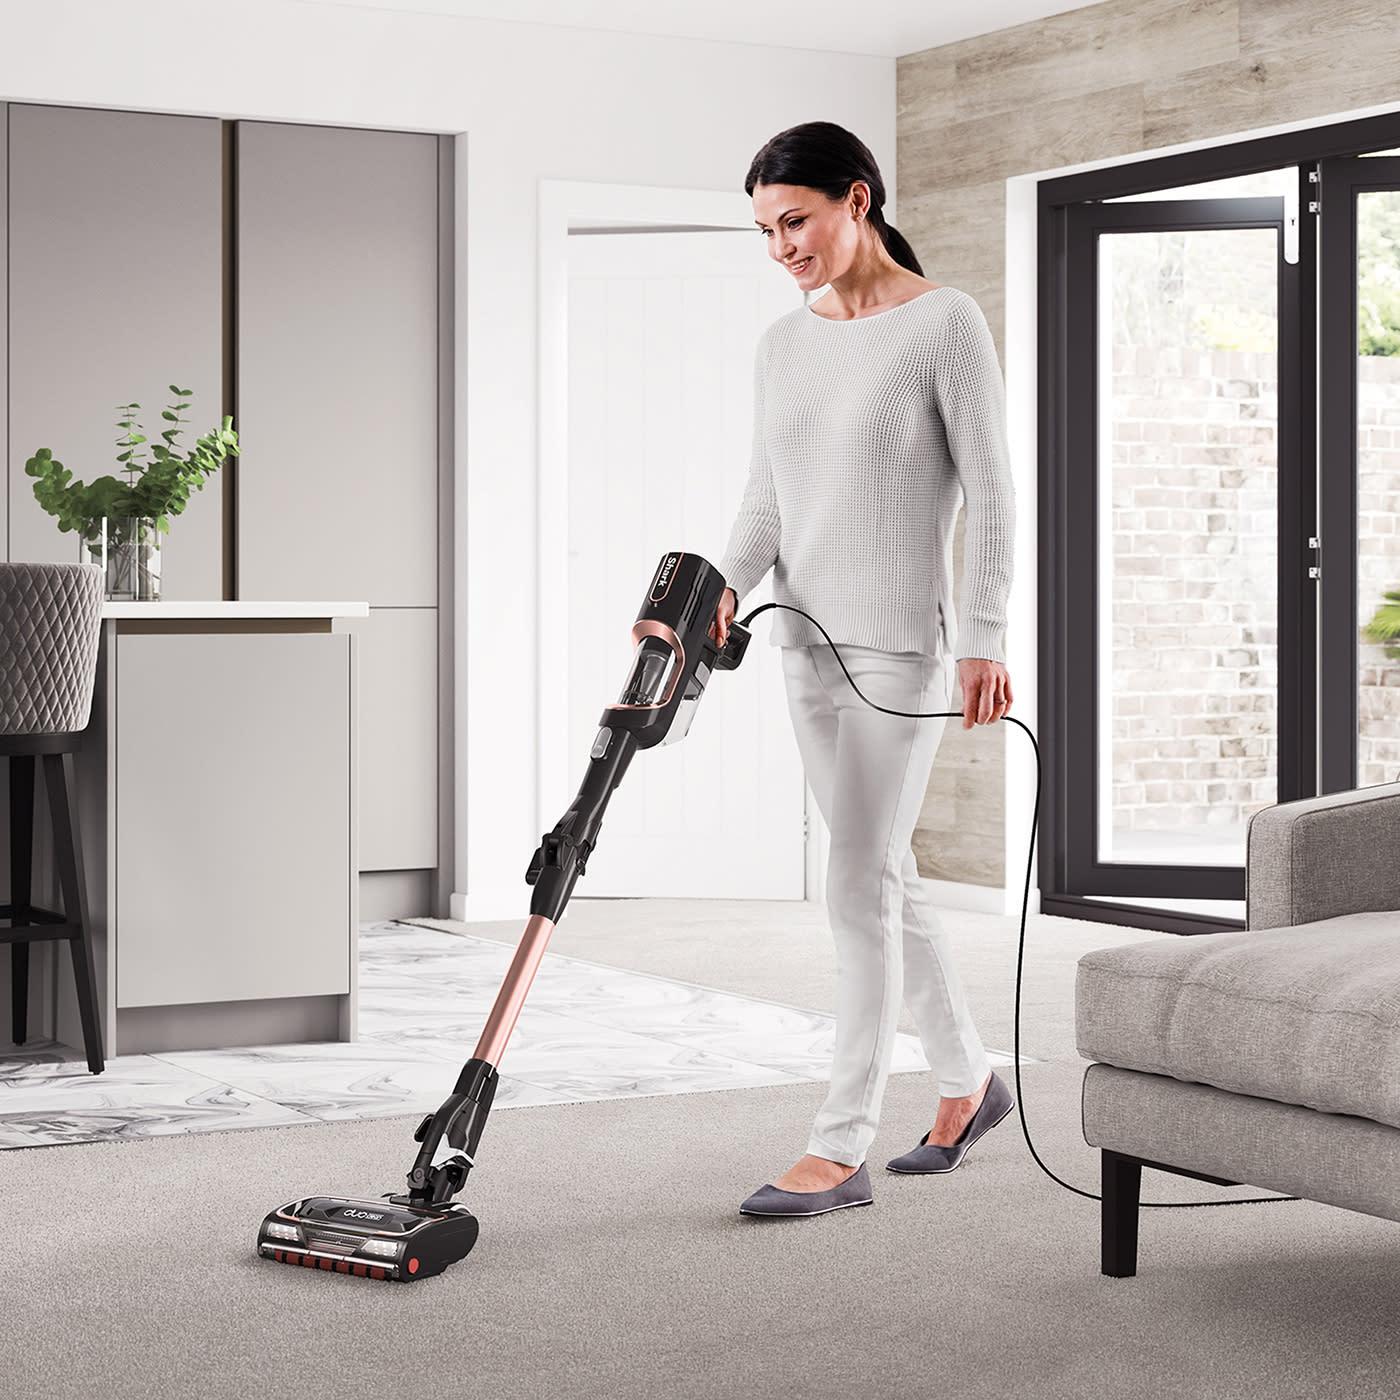 Corded Stick Vacuums